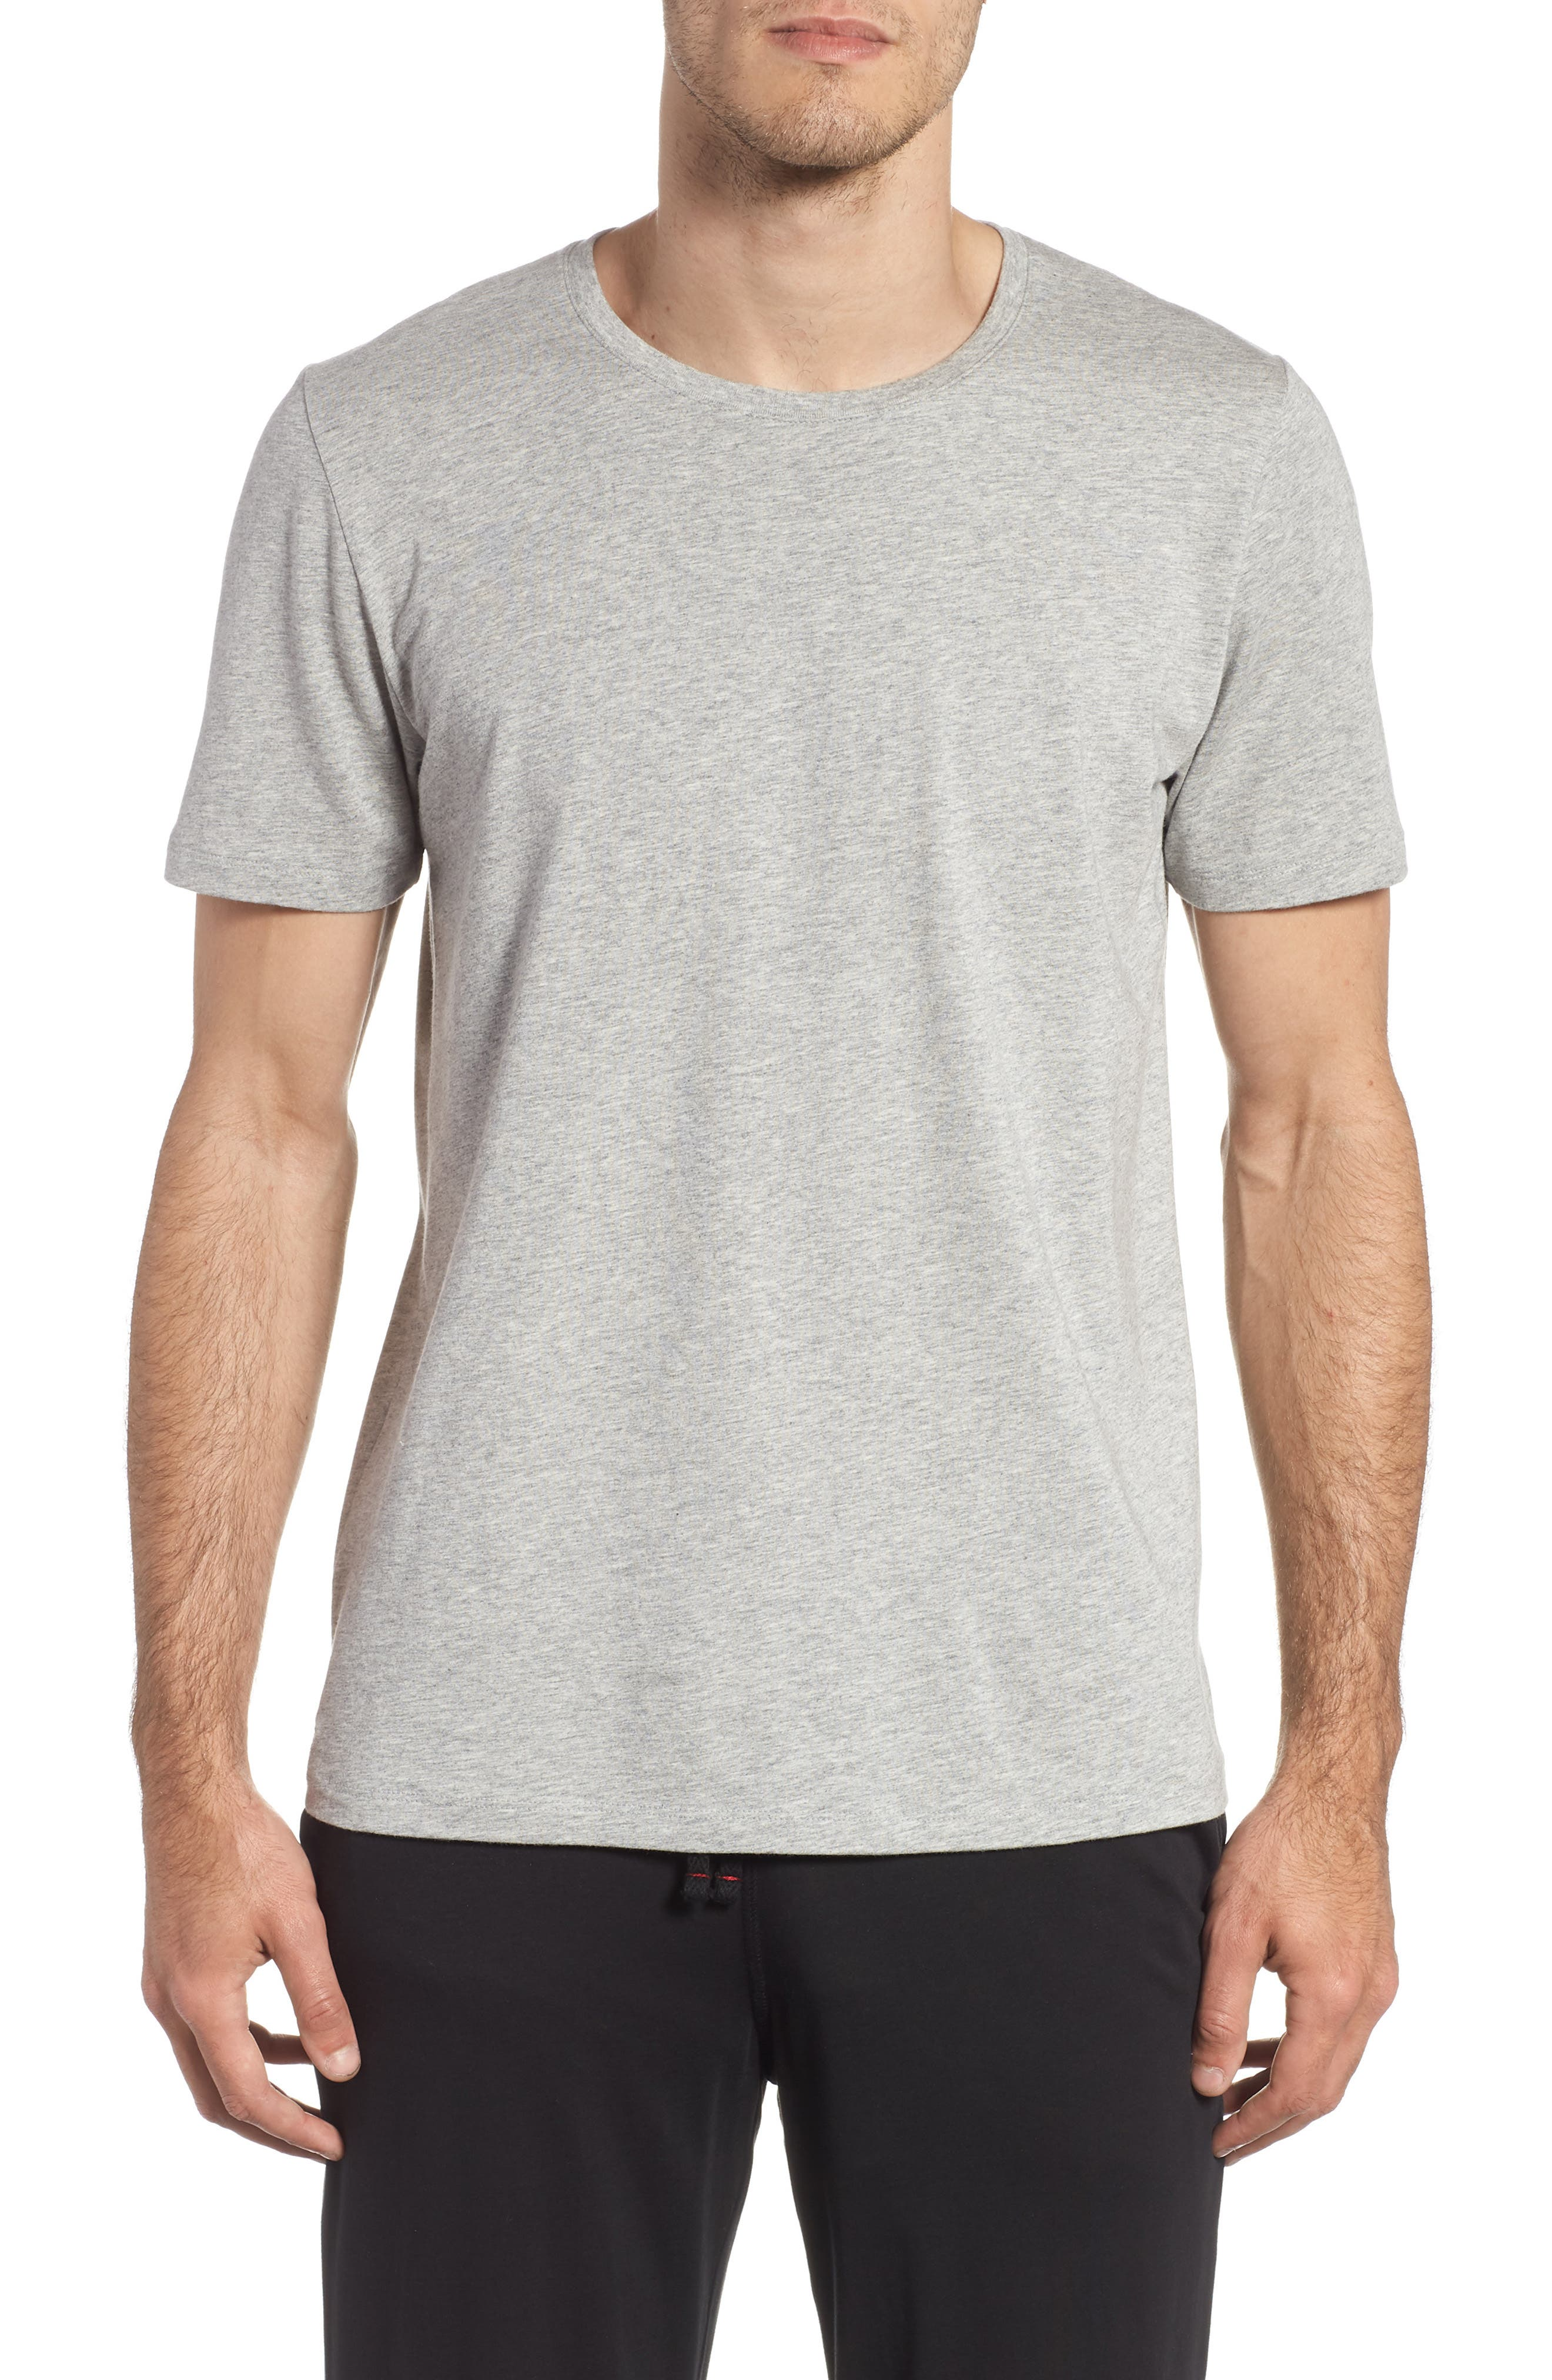 Second Skin Crewneck T-Shirt,                             Main thumbnail 1, color,                             HEATHER GREY